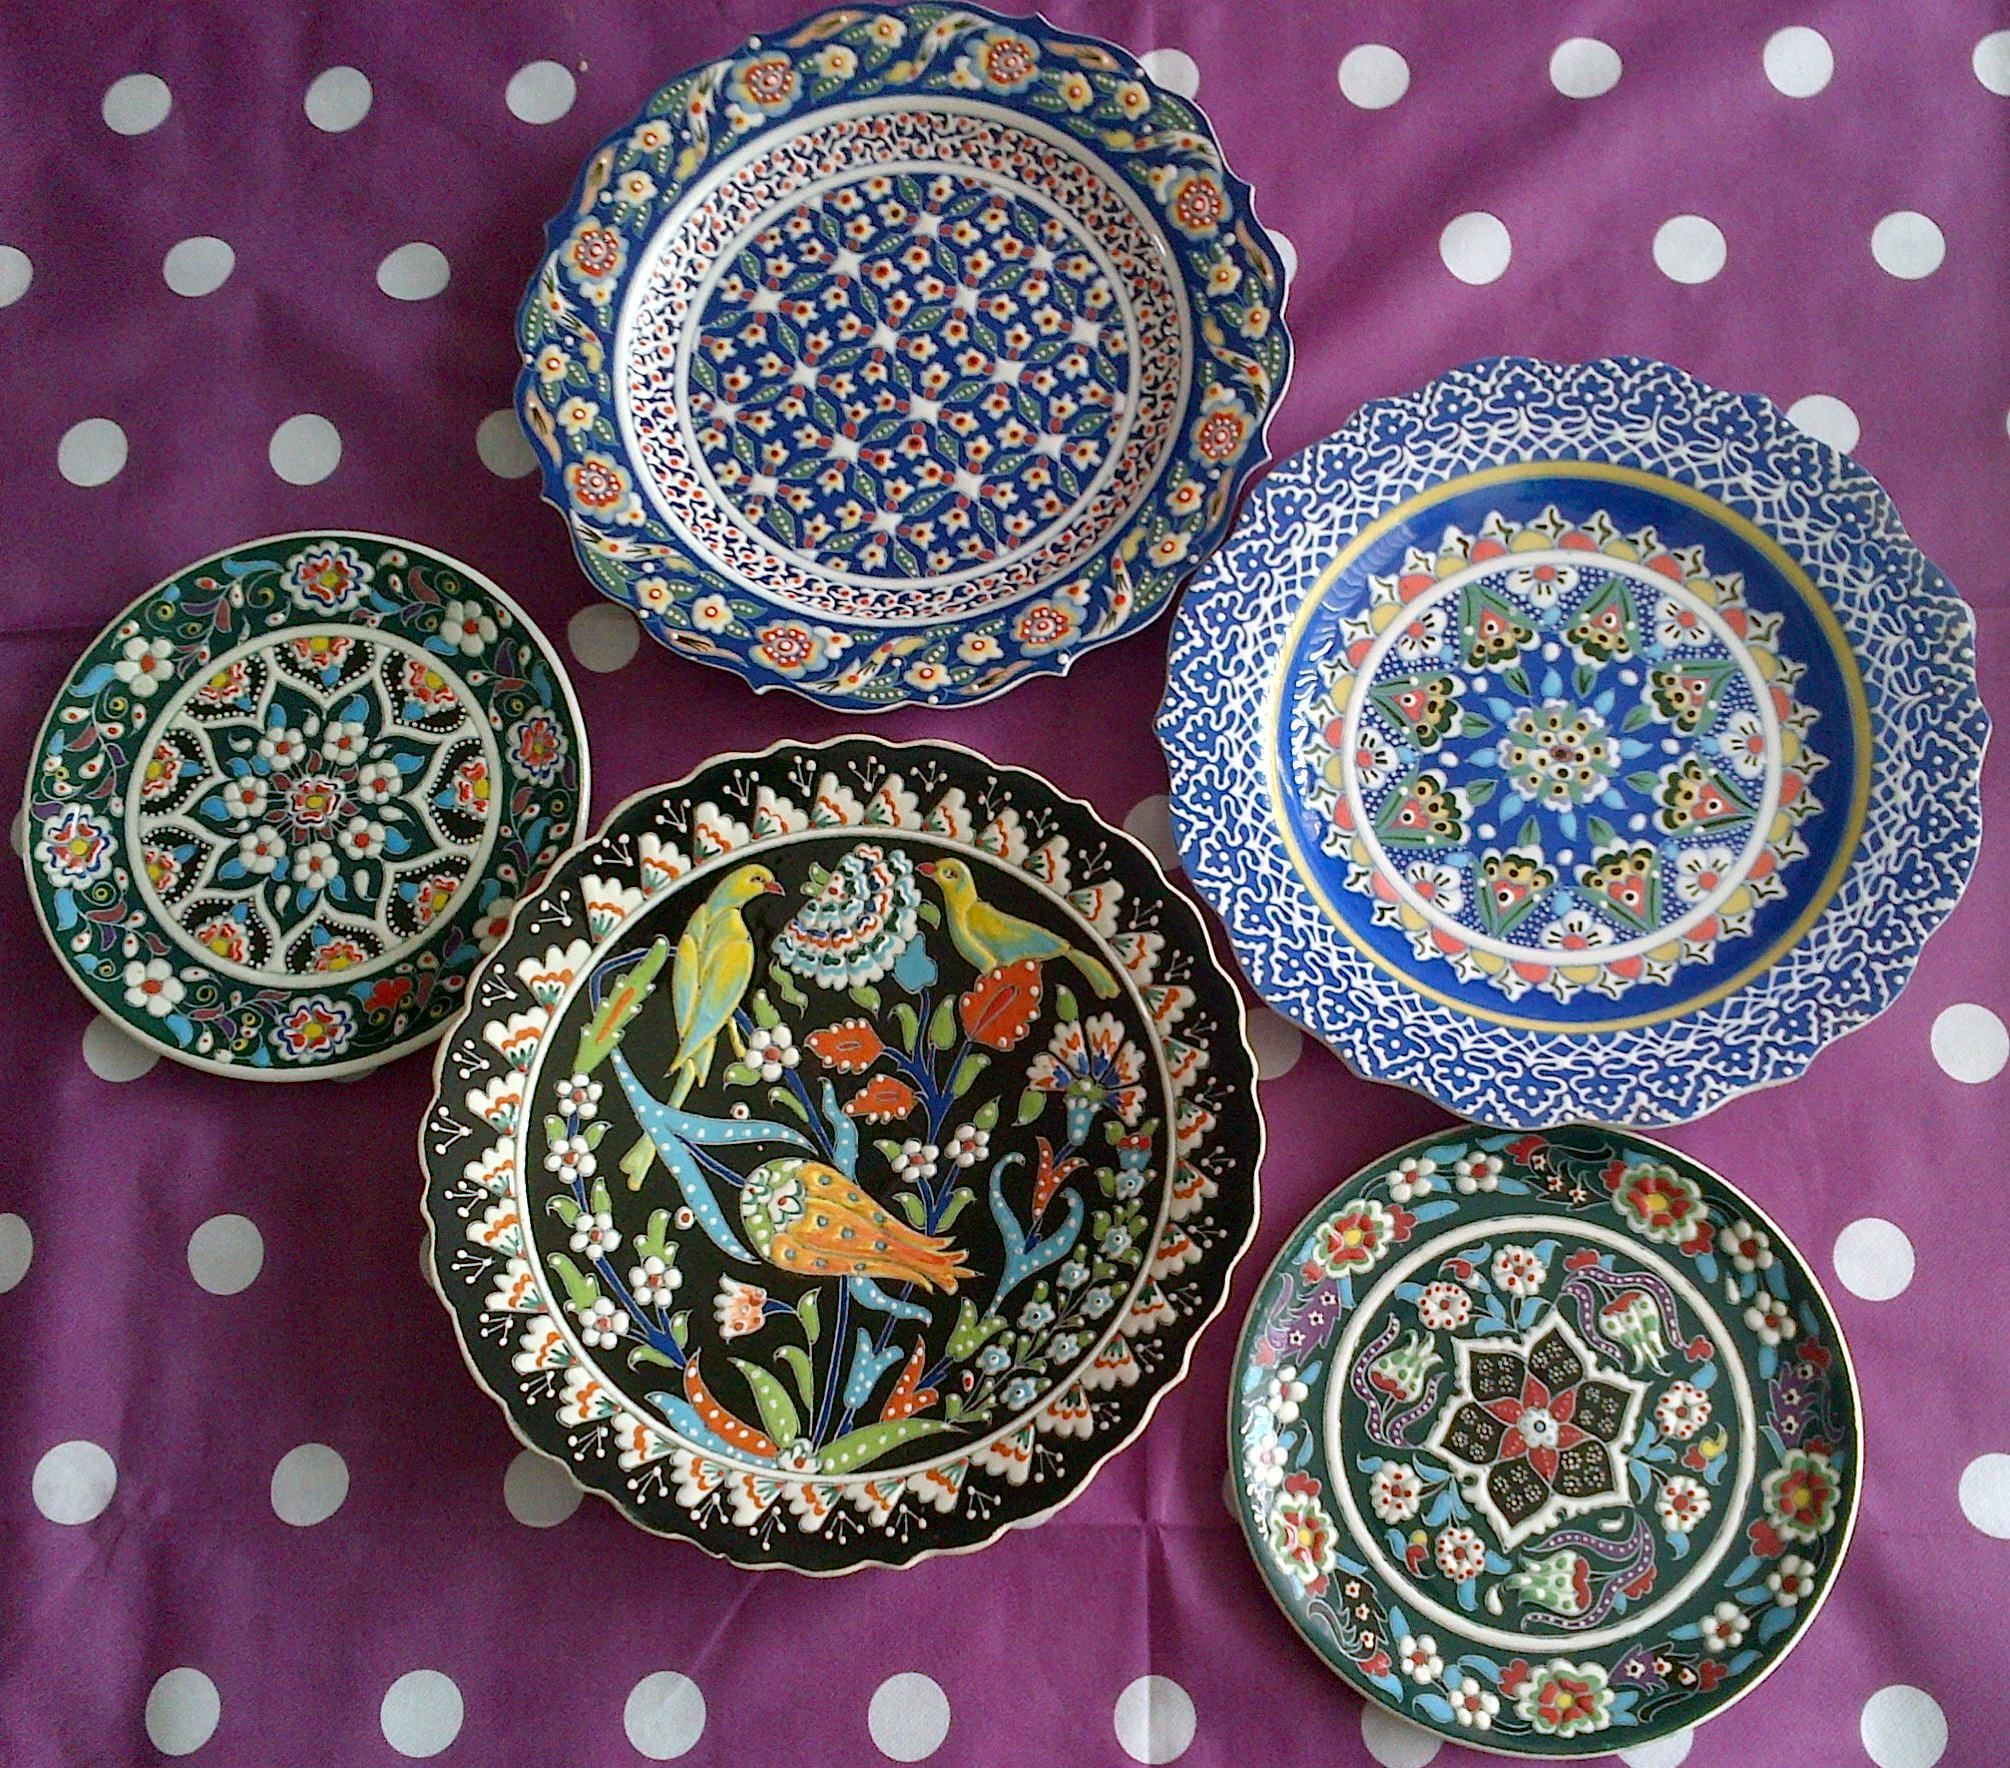 Turkish Plates Turkish Plates Plates On Wall Plate Decor